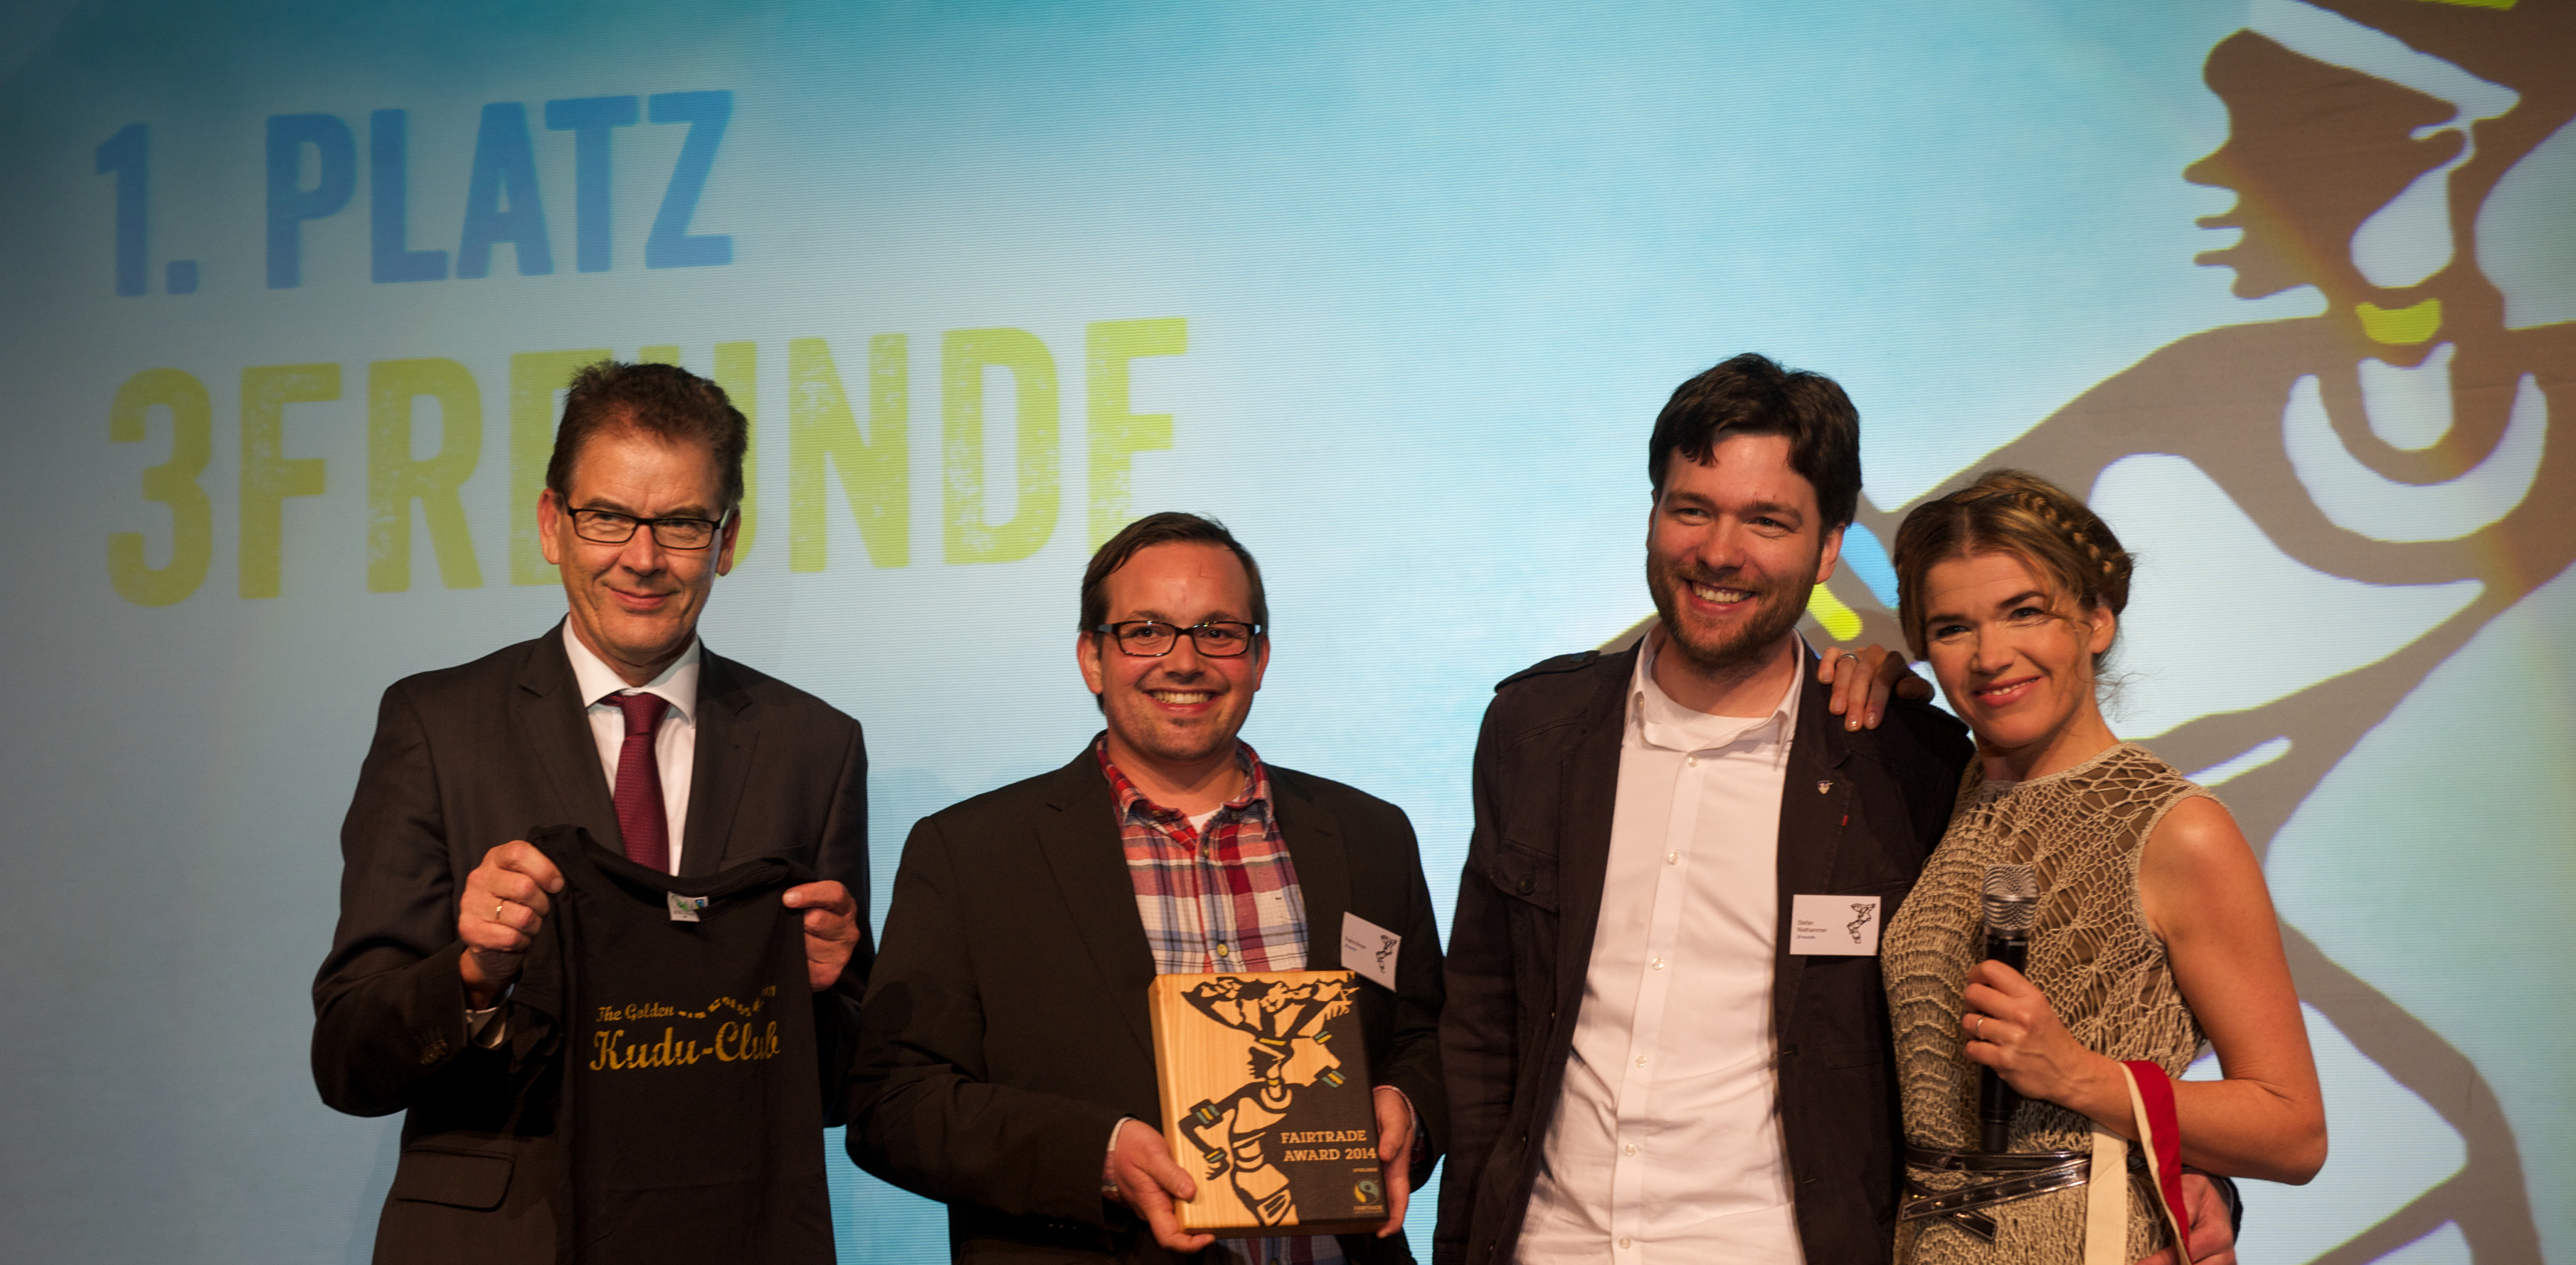 FT-Award-1